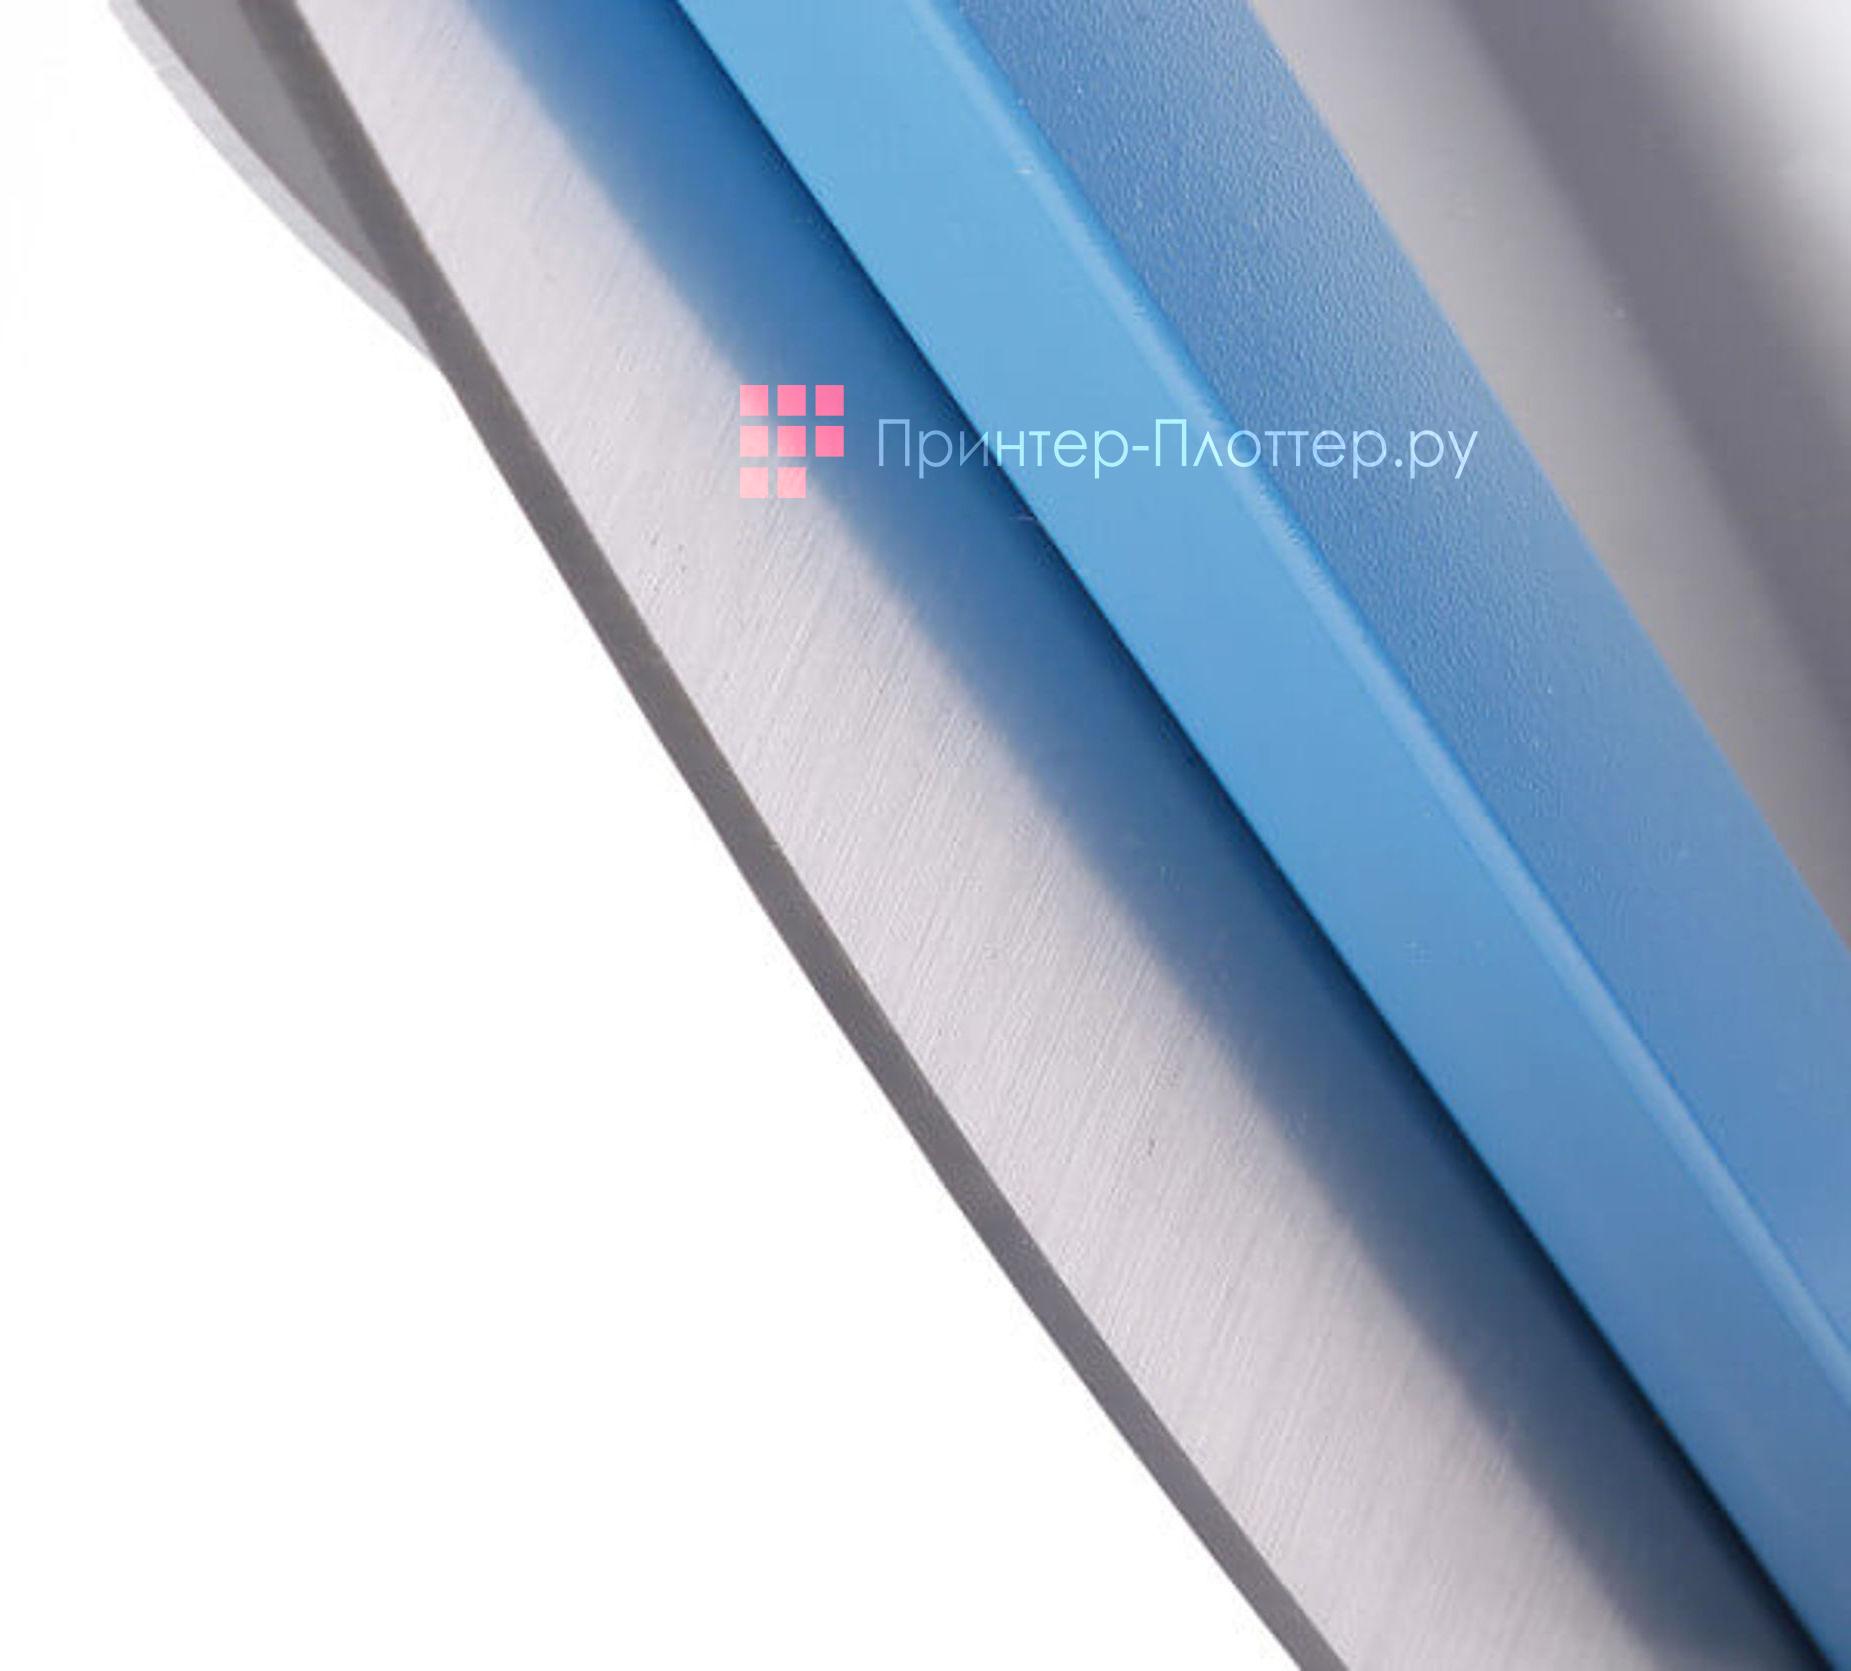 Dahle 580. Нож для материалов